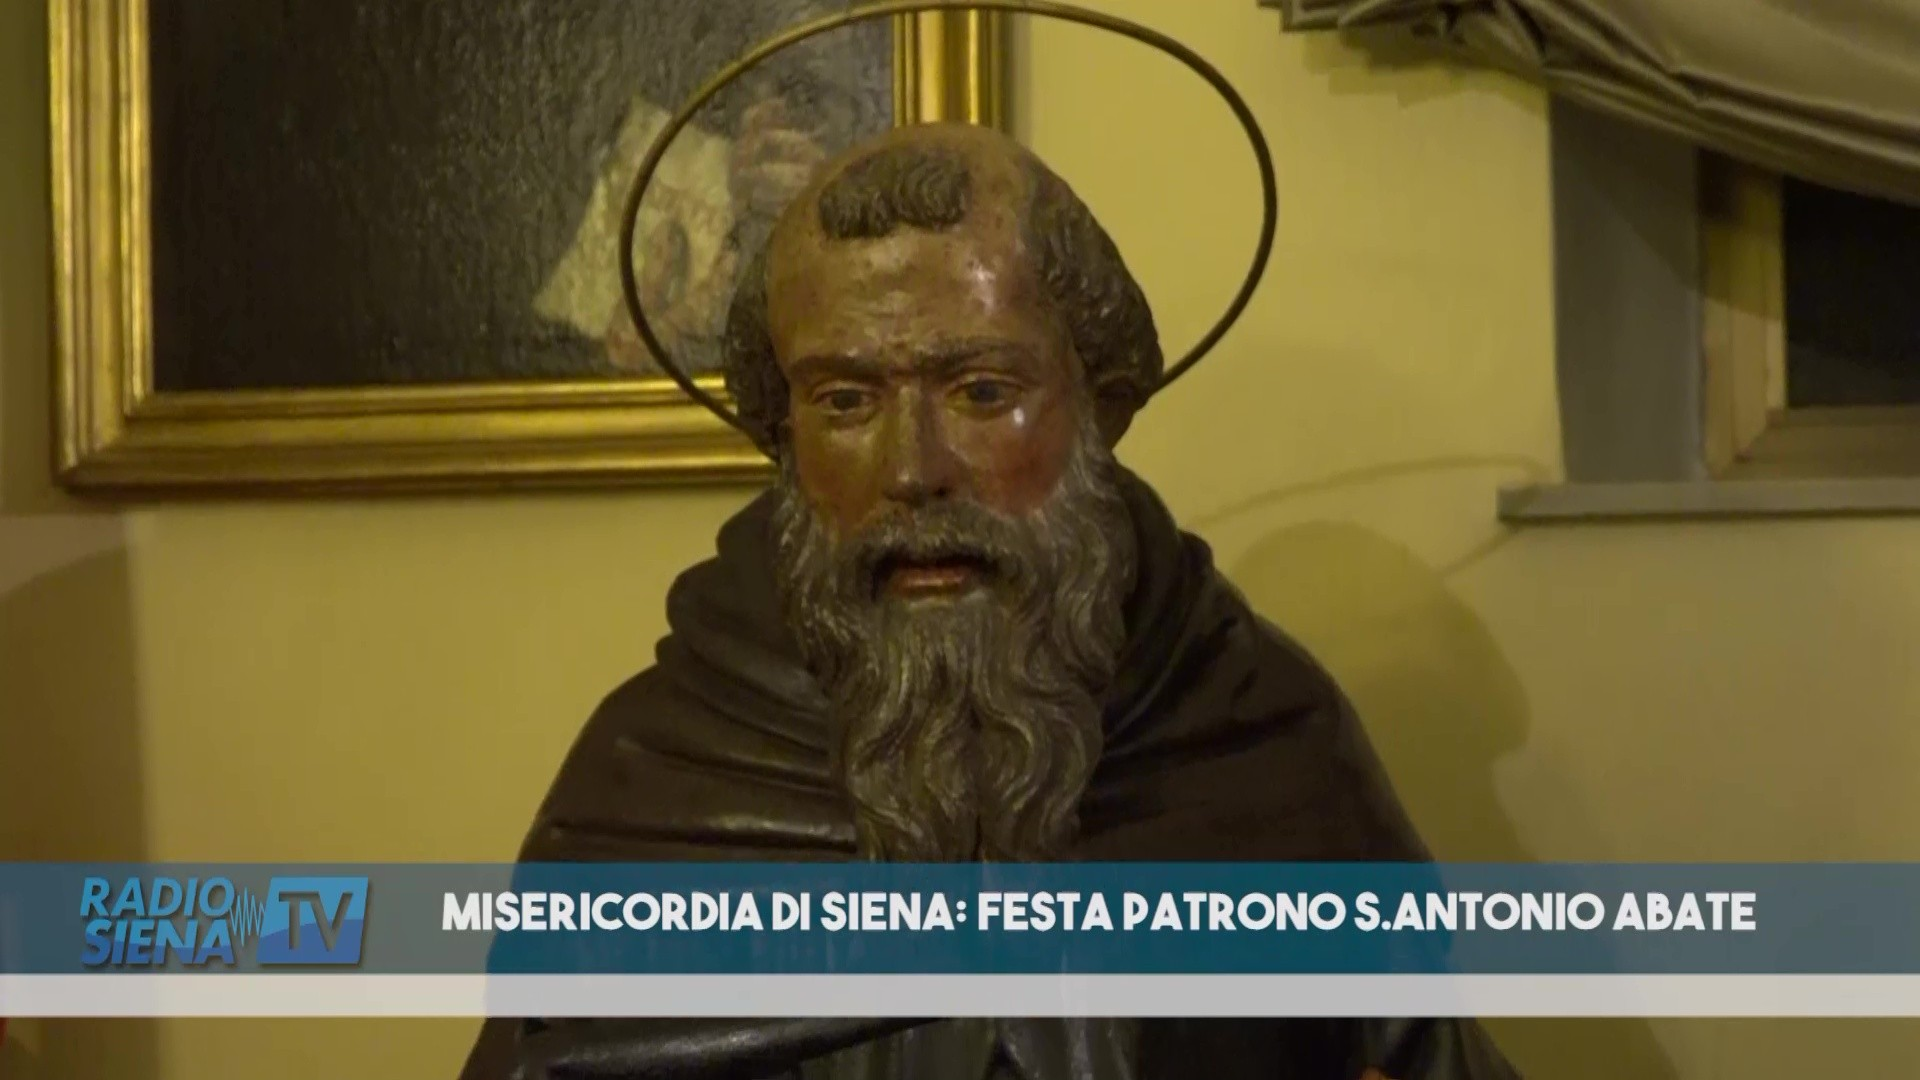 FESTA S.ANTONIO ABATE MISERICORDIA SIENA